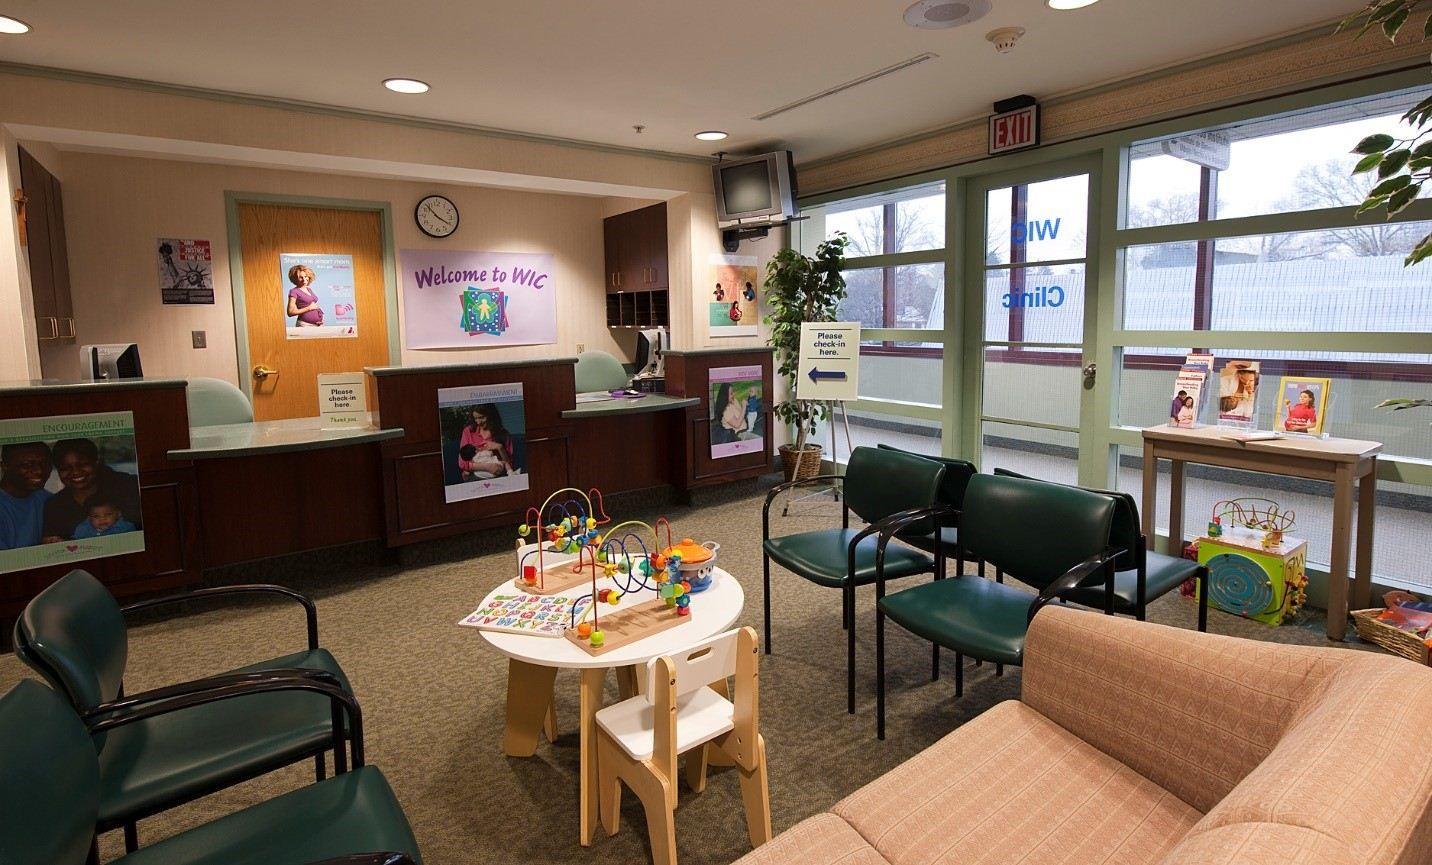 Nassau County Department Of Health - WIC